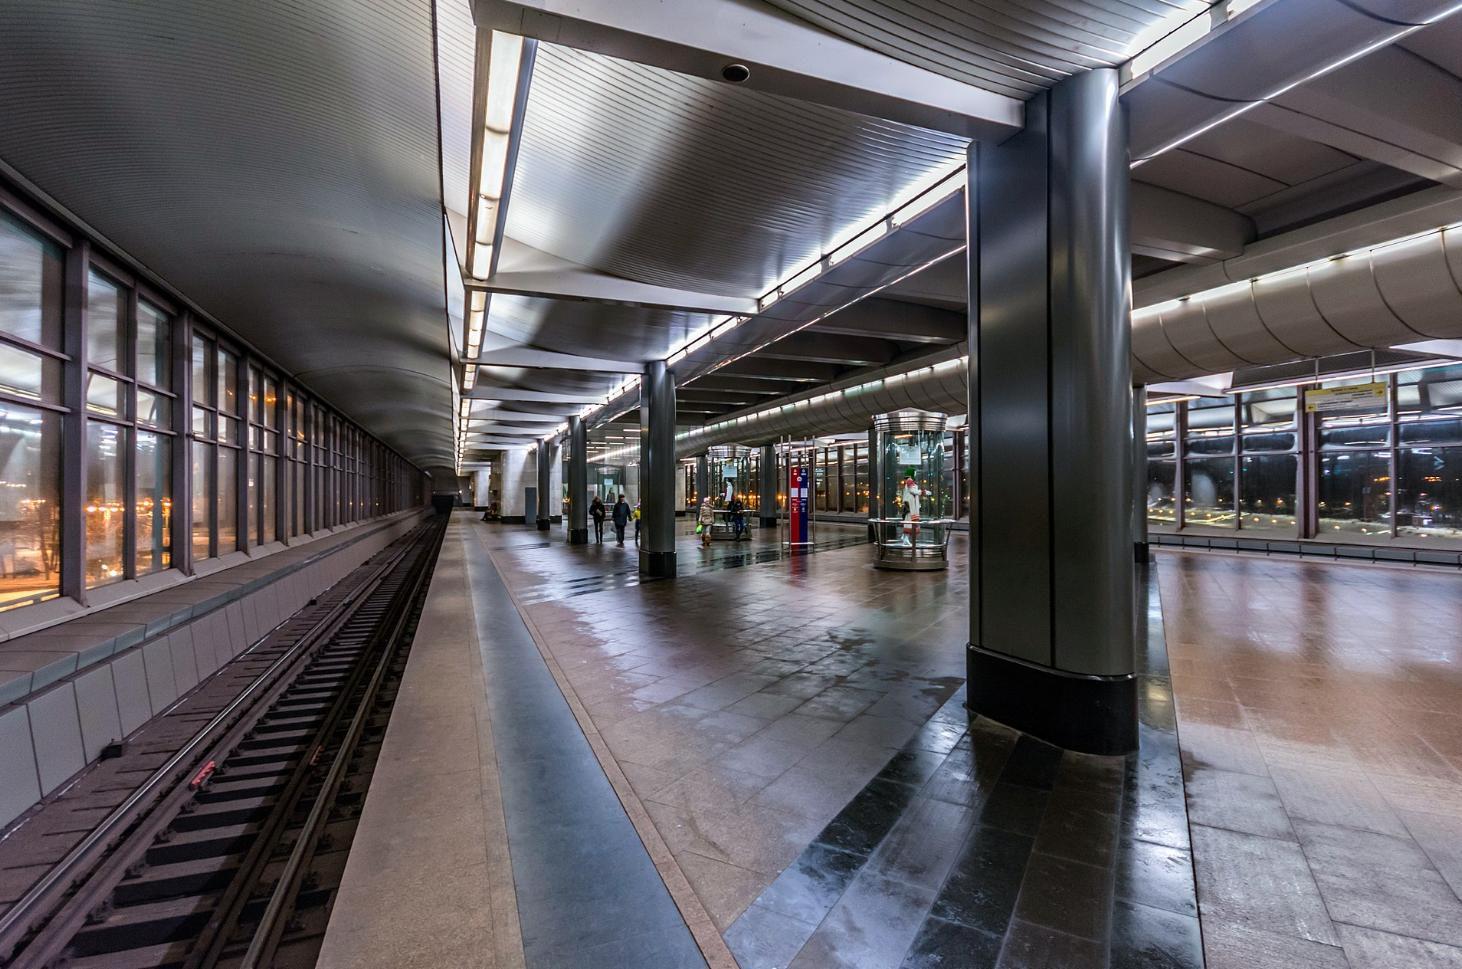 гей знакомства по станциям метро